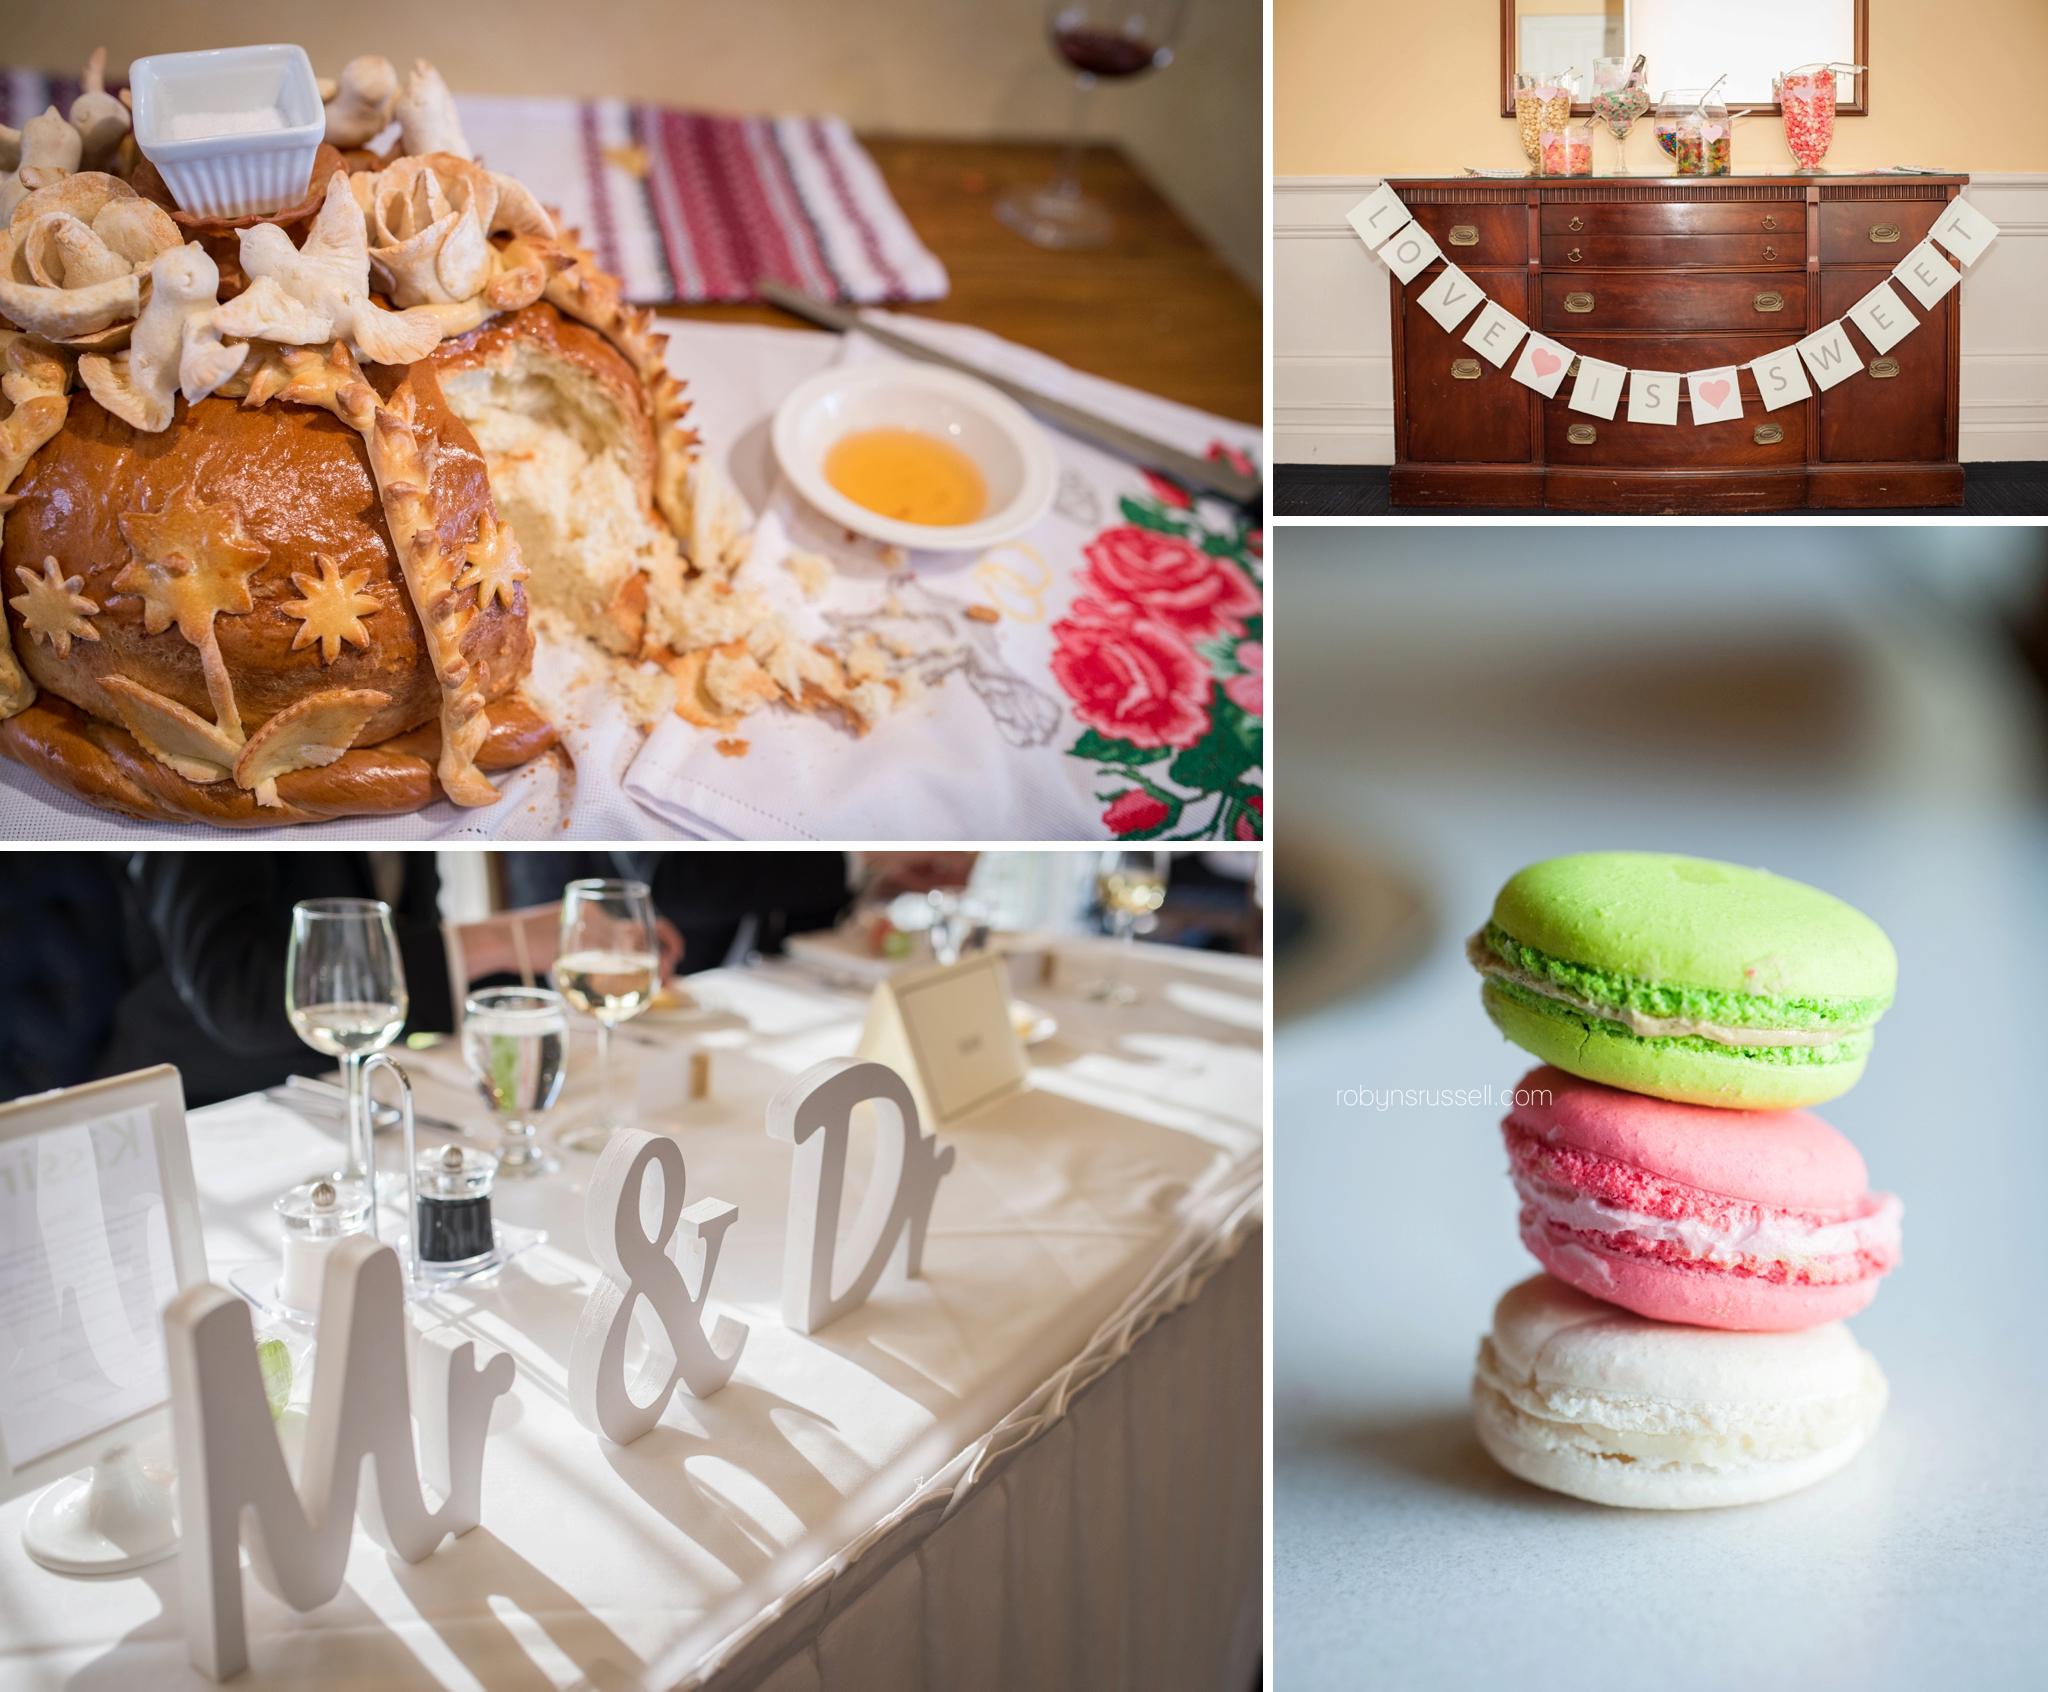 36-wedding-details-macarons-sweet-table-ukrainian-korovayi-bread.jpg